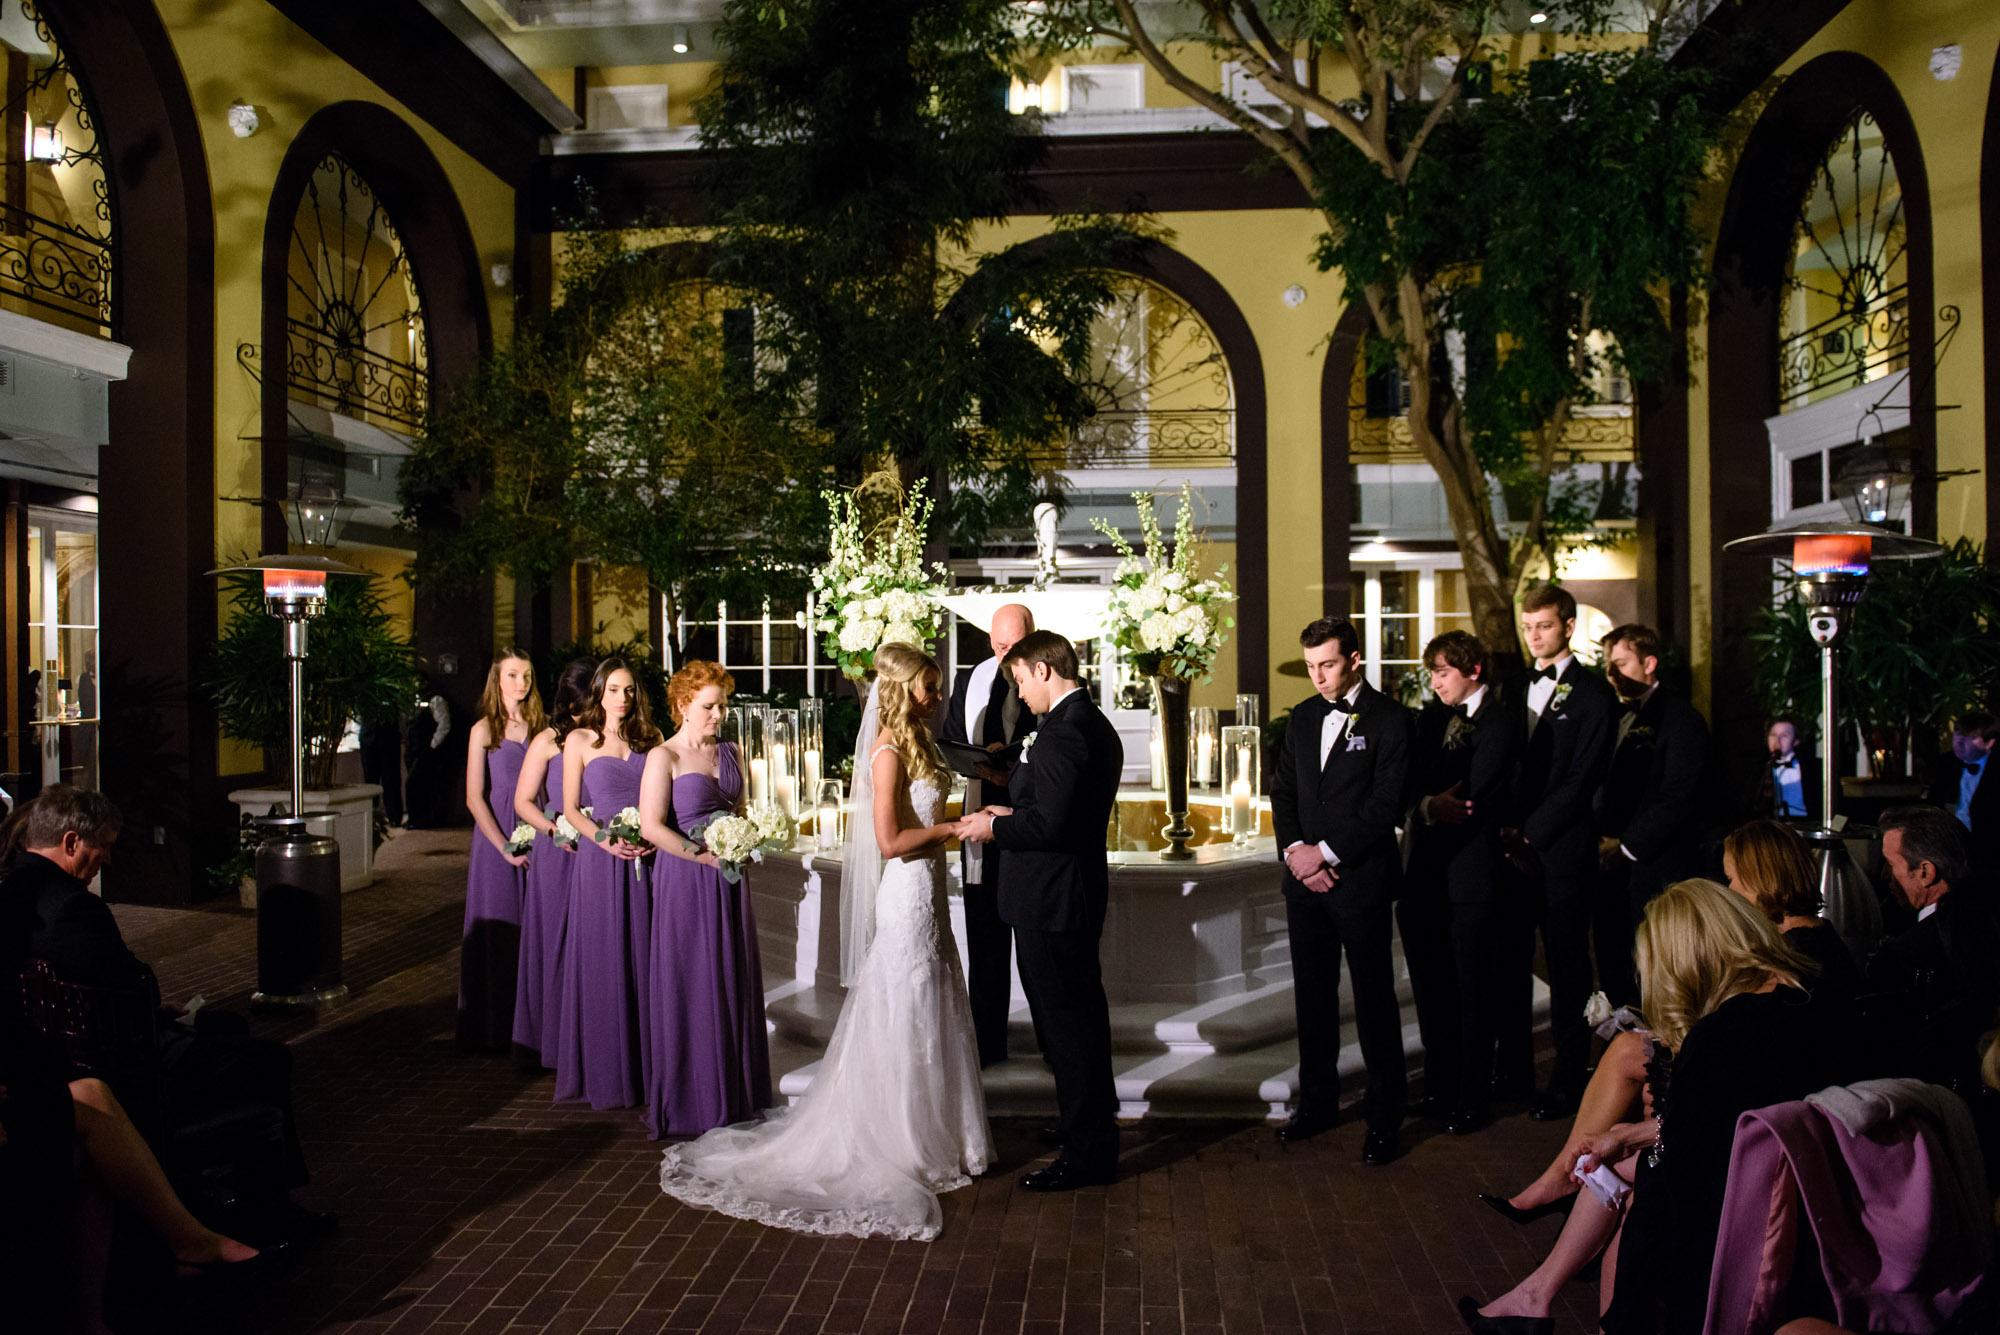 Wedding ceremony at New Orleans' Hotel Mazarin